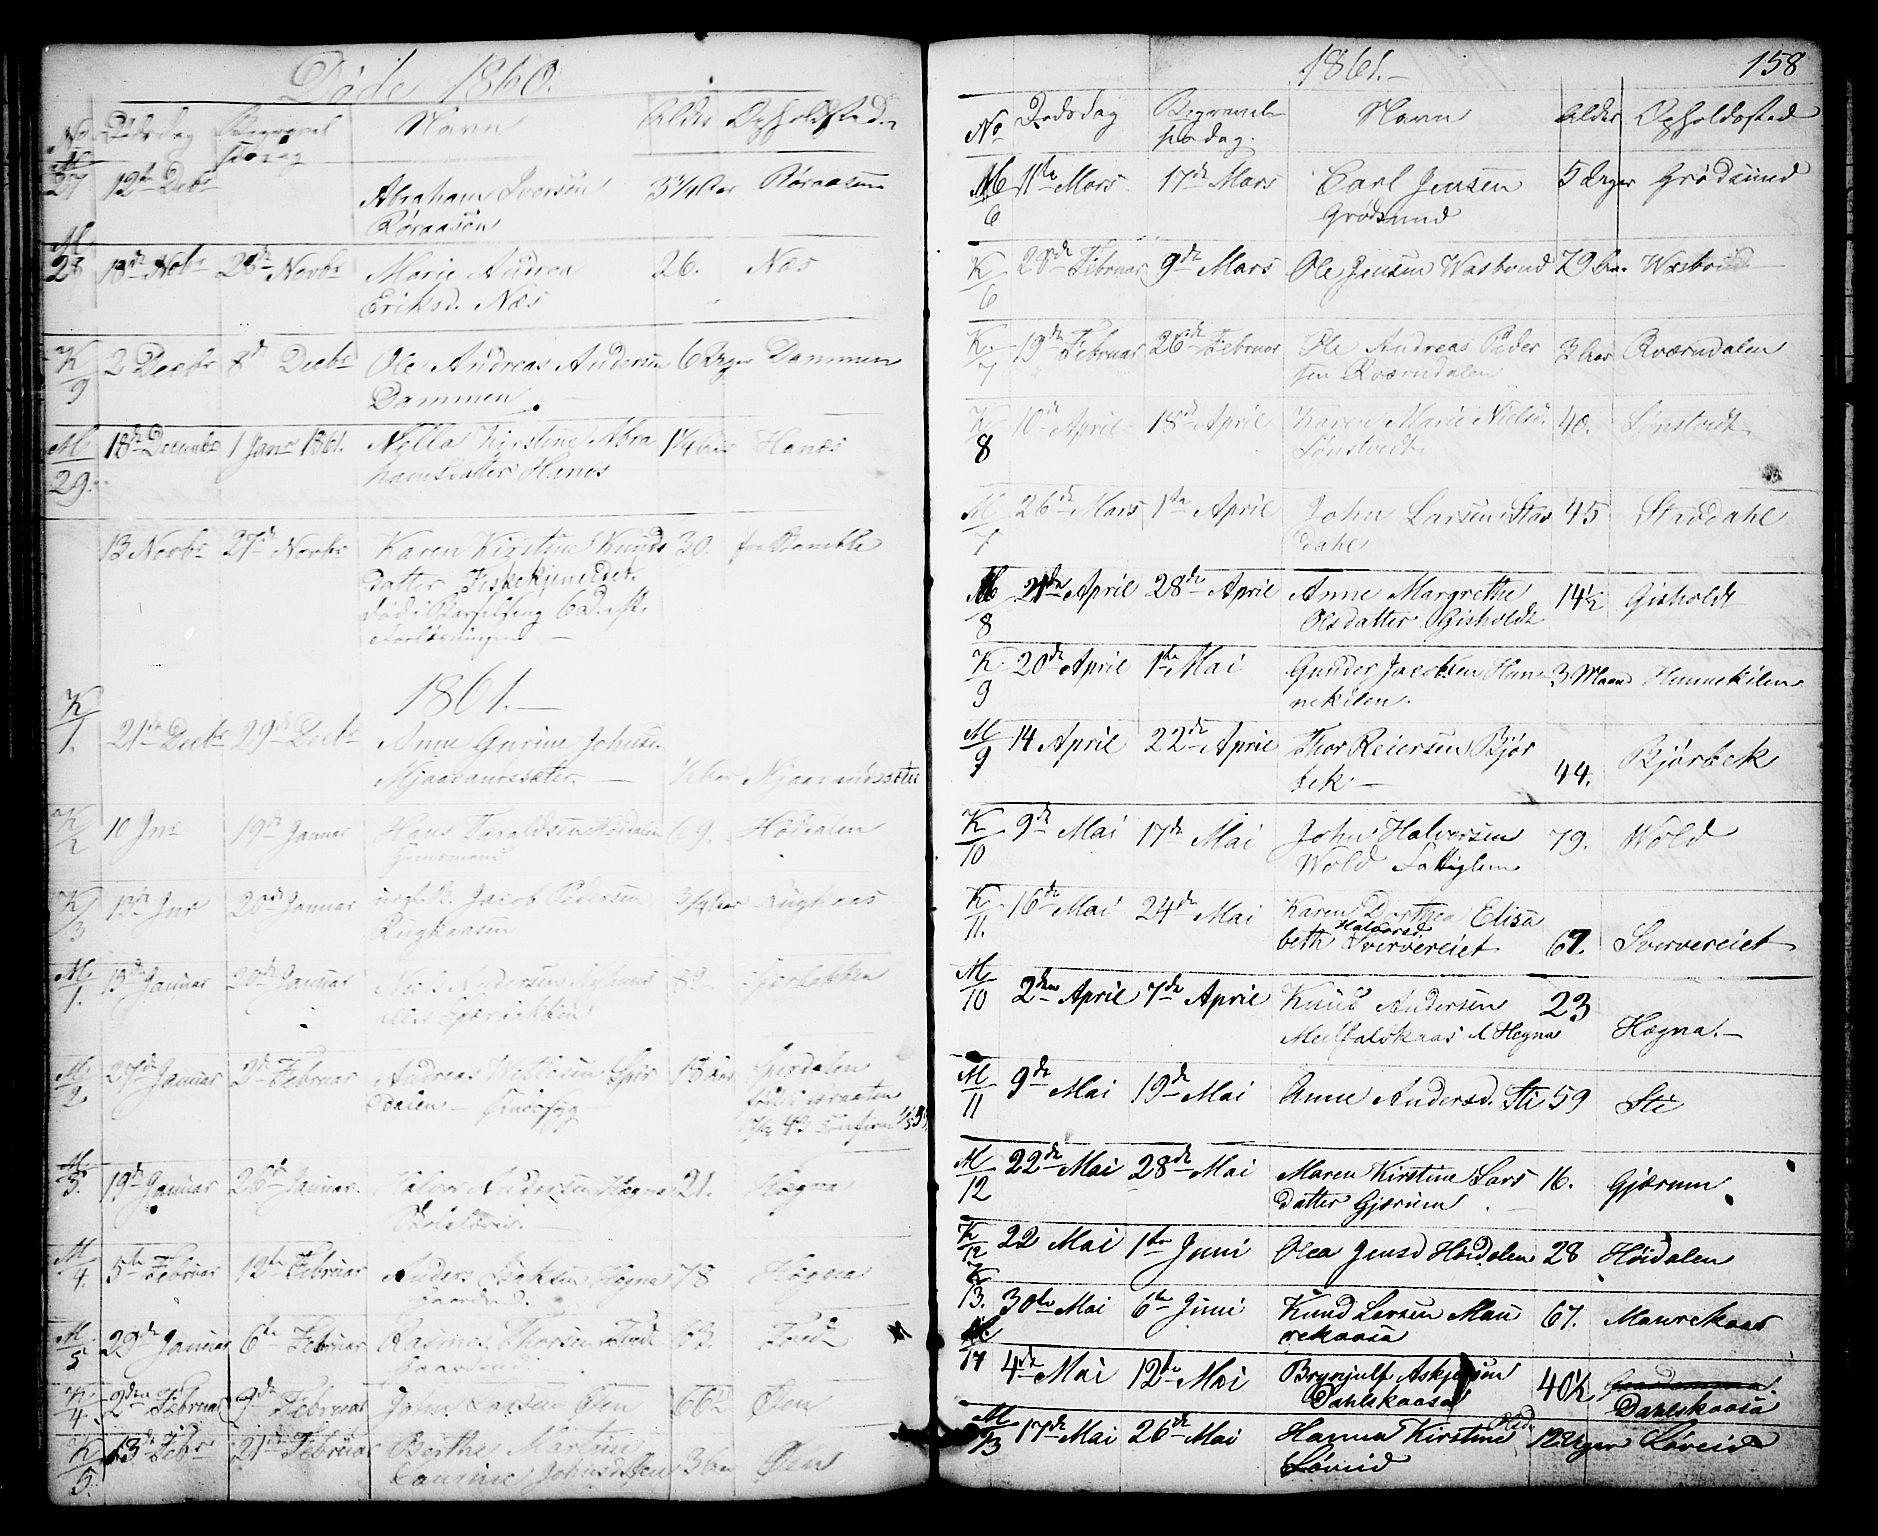 SAKO, Solum kirkebøker, G/Gb/L0002: Klokkerbok nr. II 2, 1859-1879, s. 158